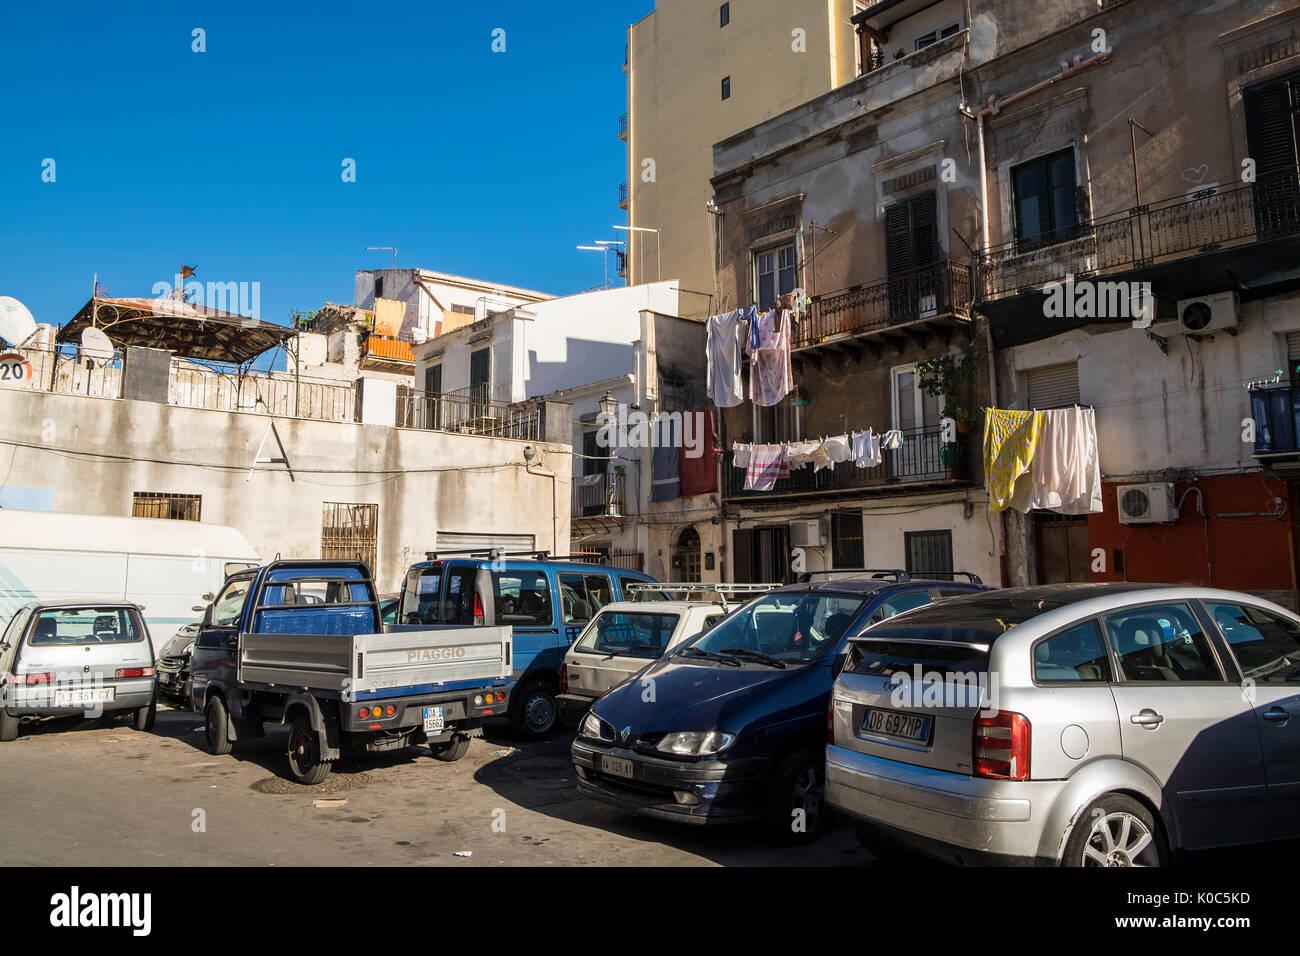 Italy, Sicily, Palermo, Ballarò - Stock Image